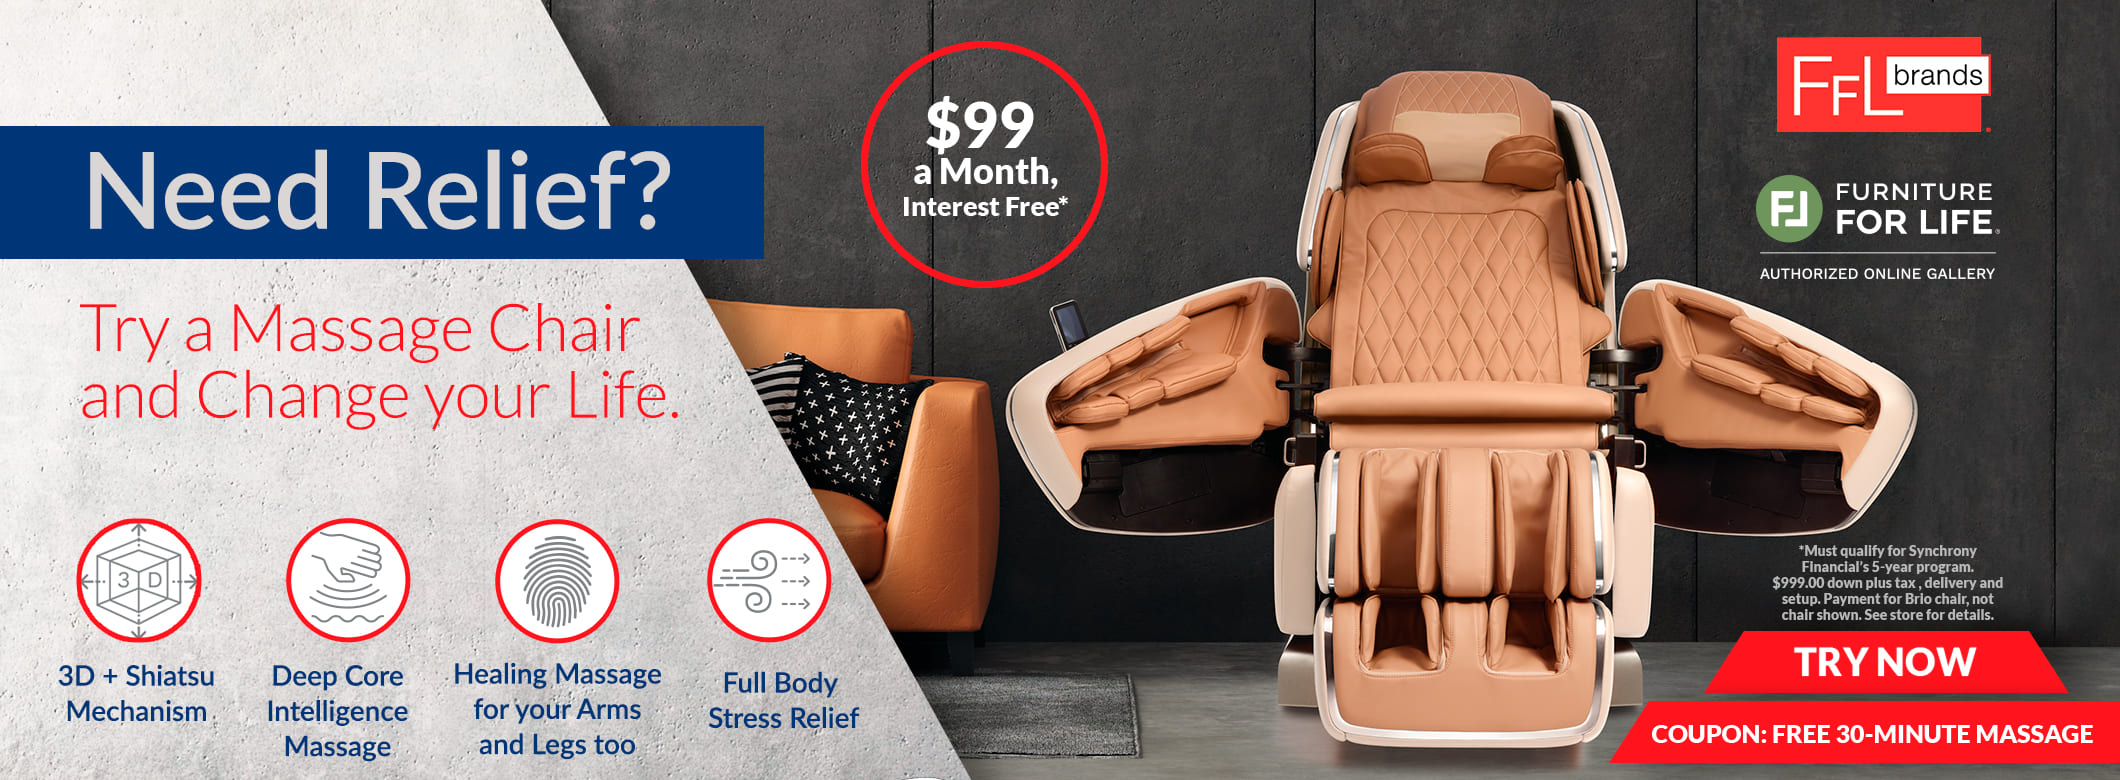 Need Relief Massage 99 promo